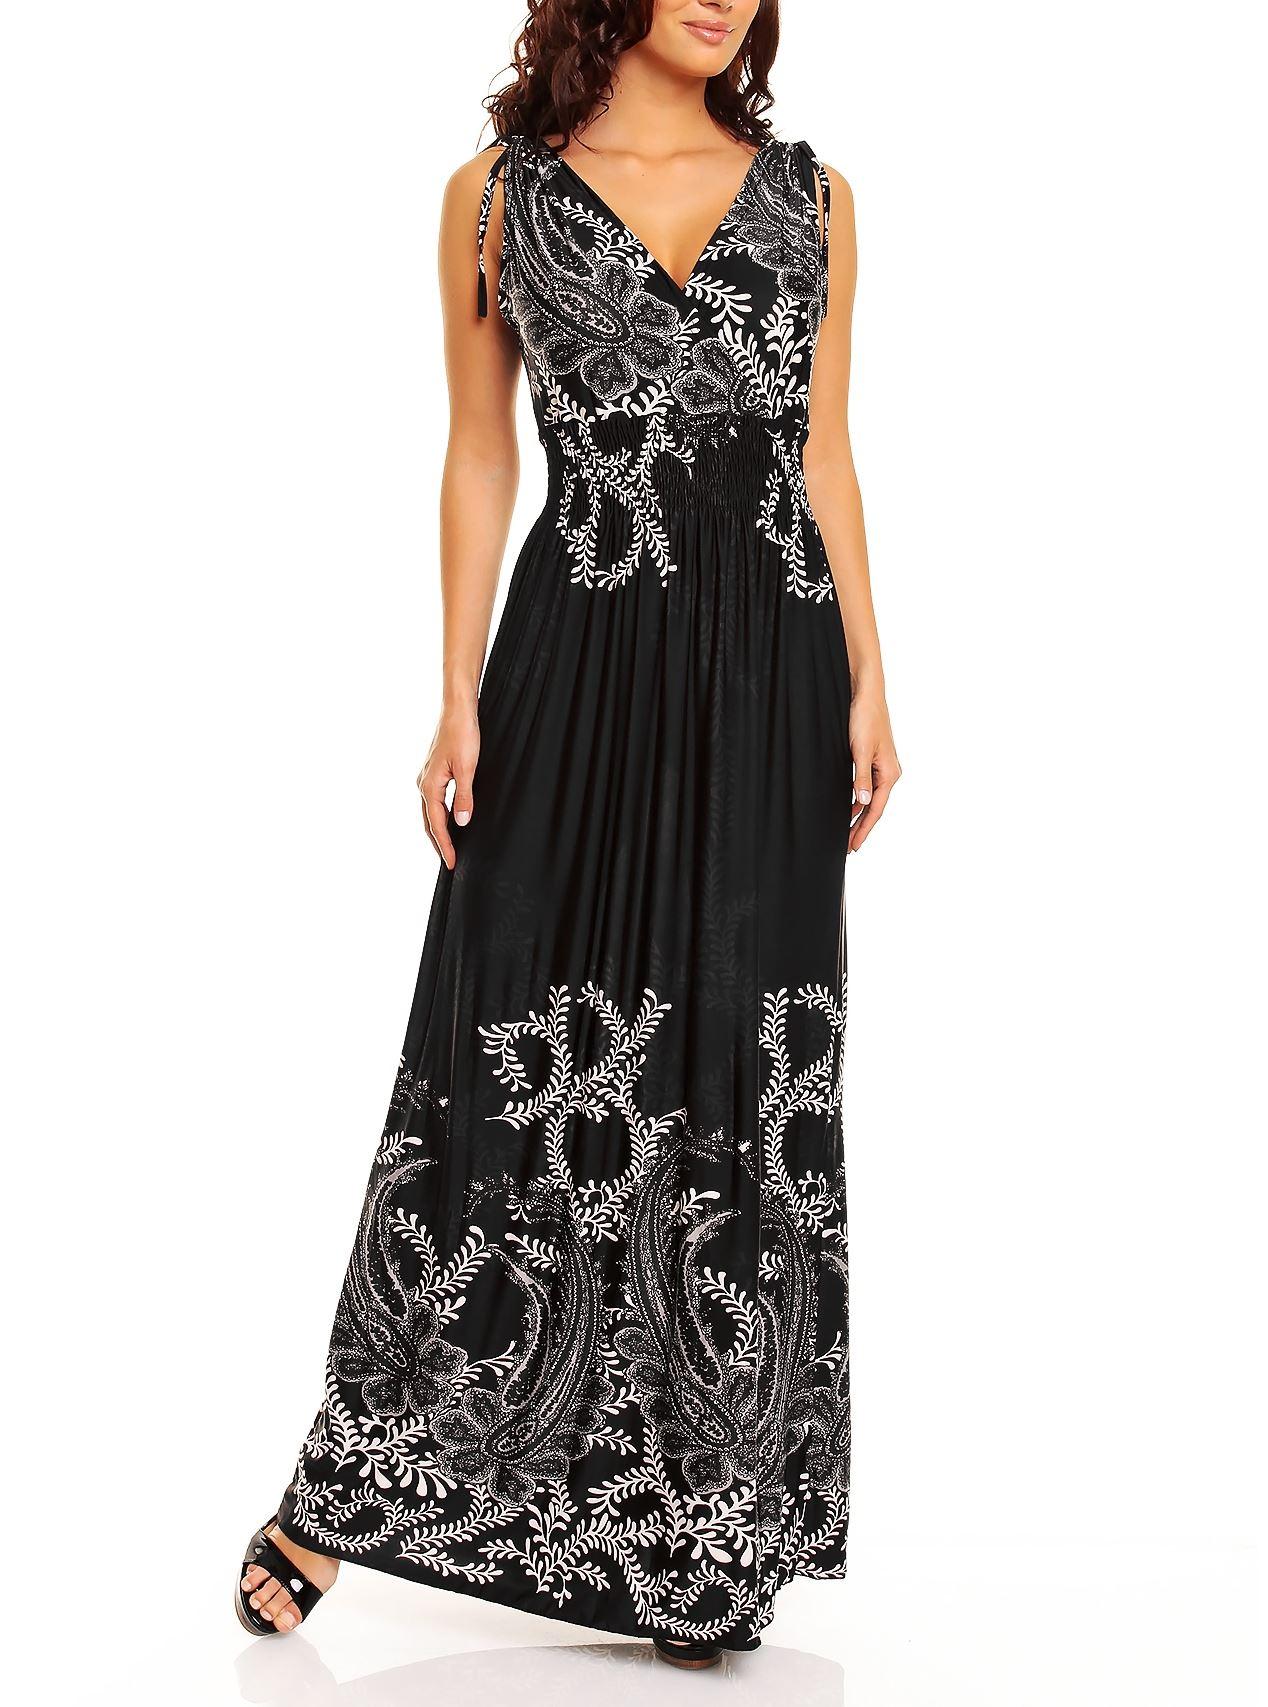 Newest Dresses